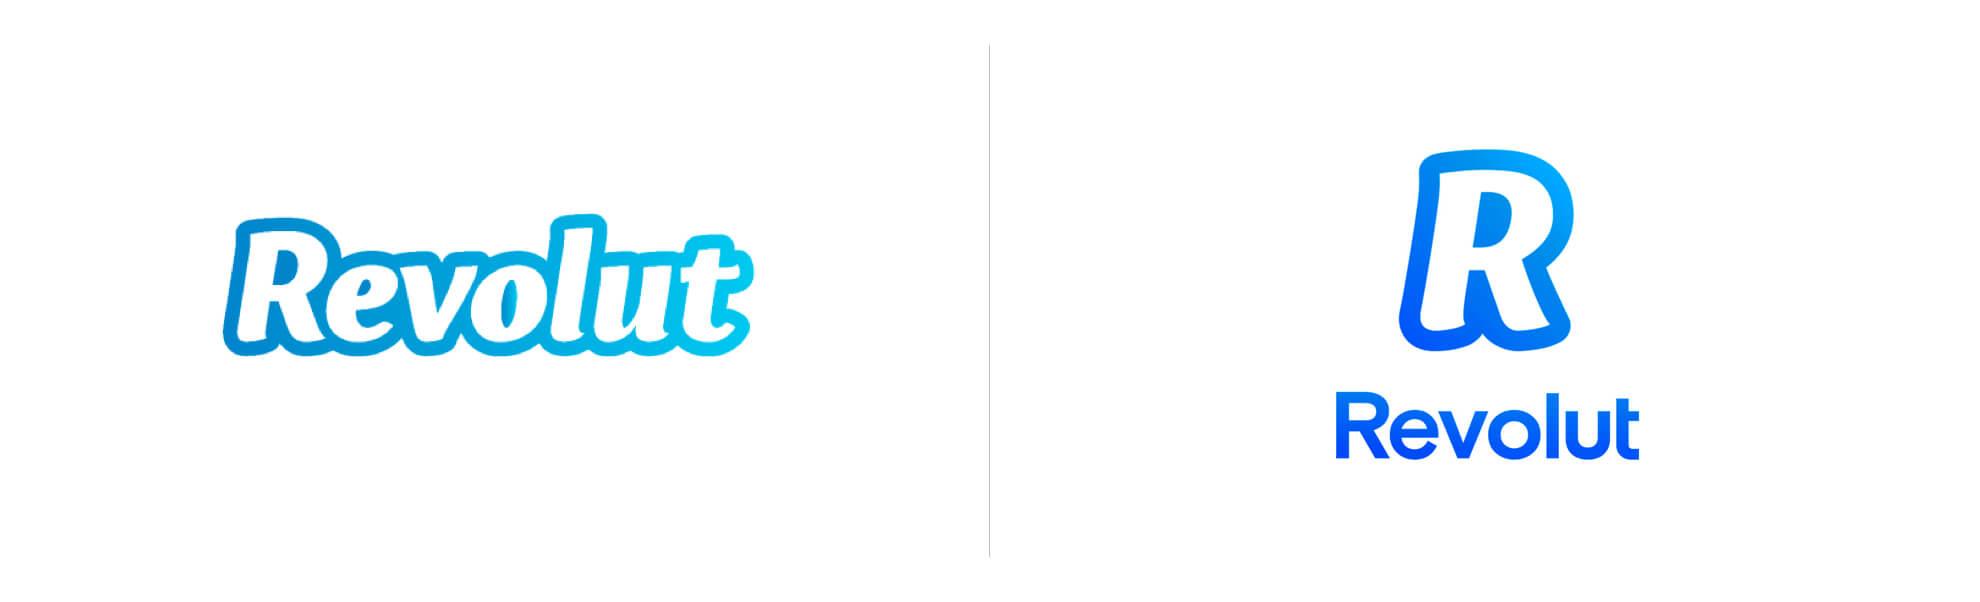 stare inowe logo revoluta